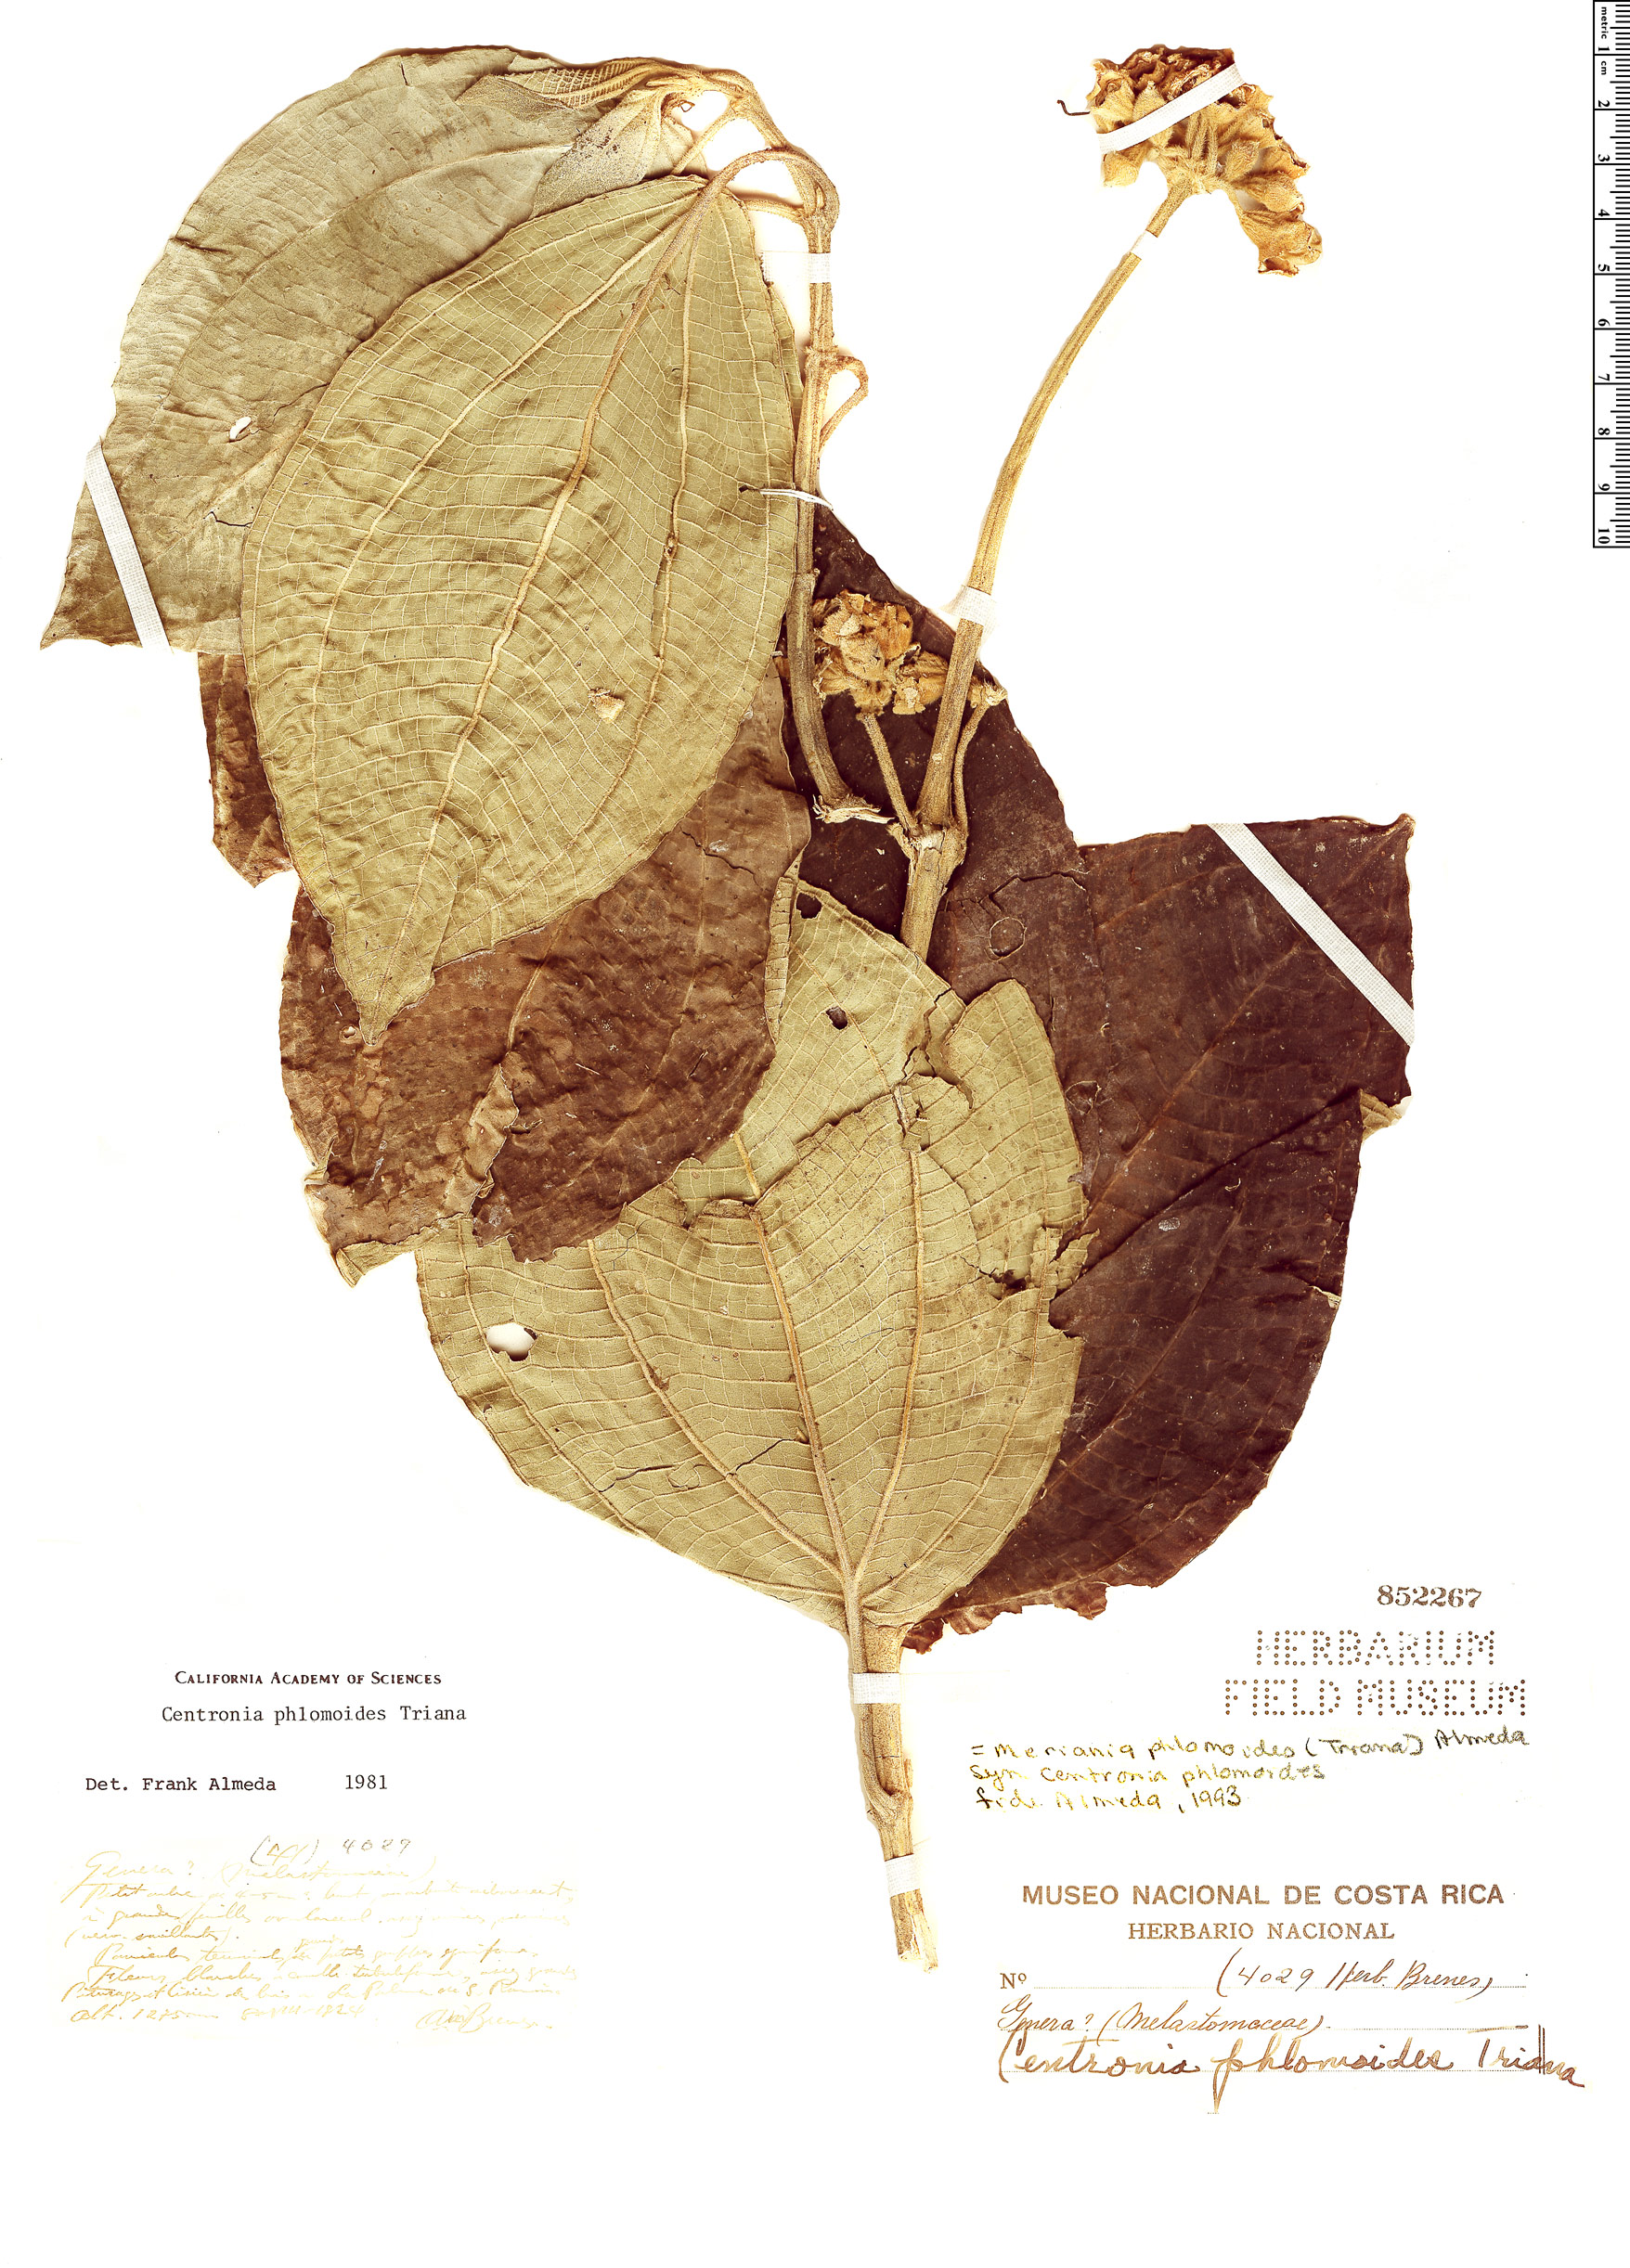 Espécimen: Meriania phlomoides